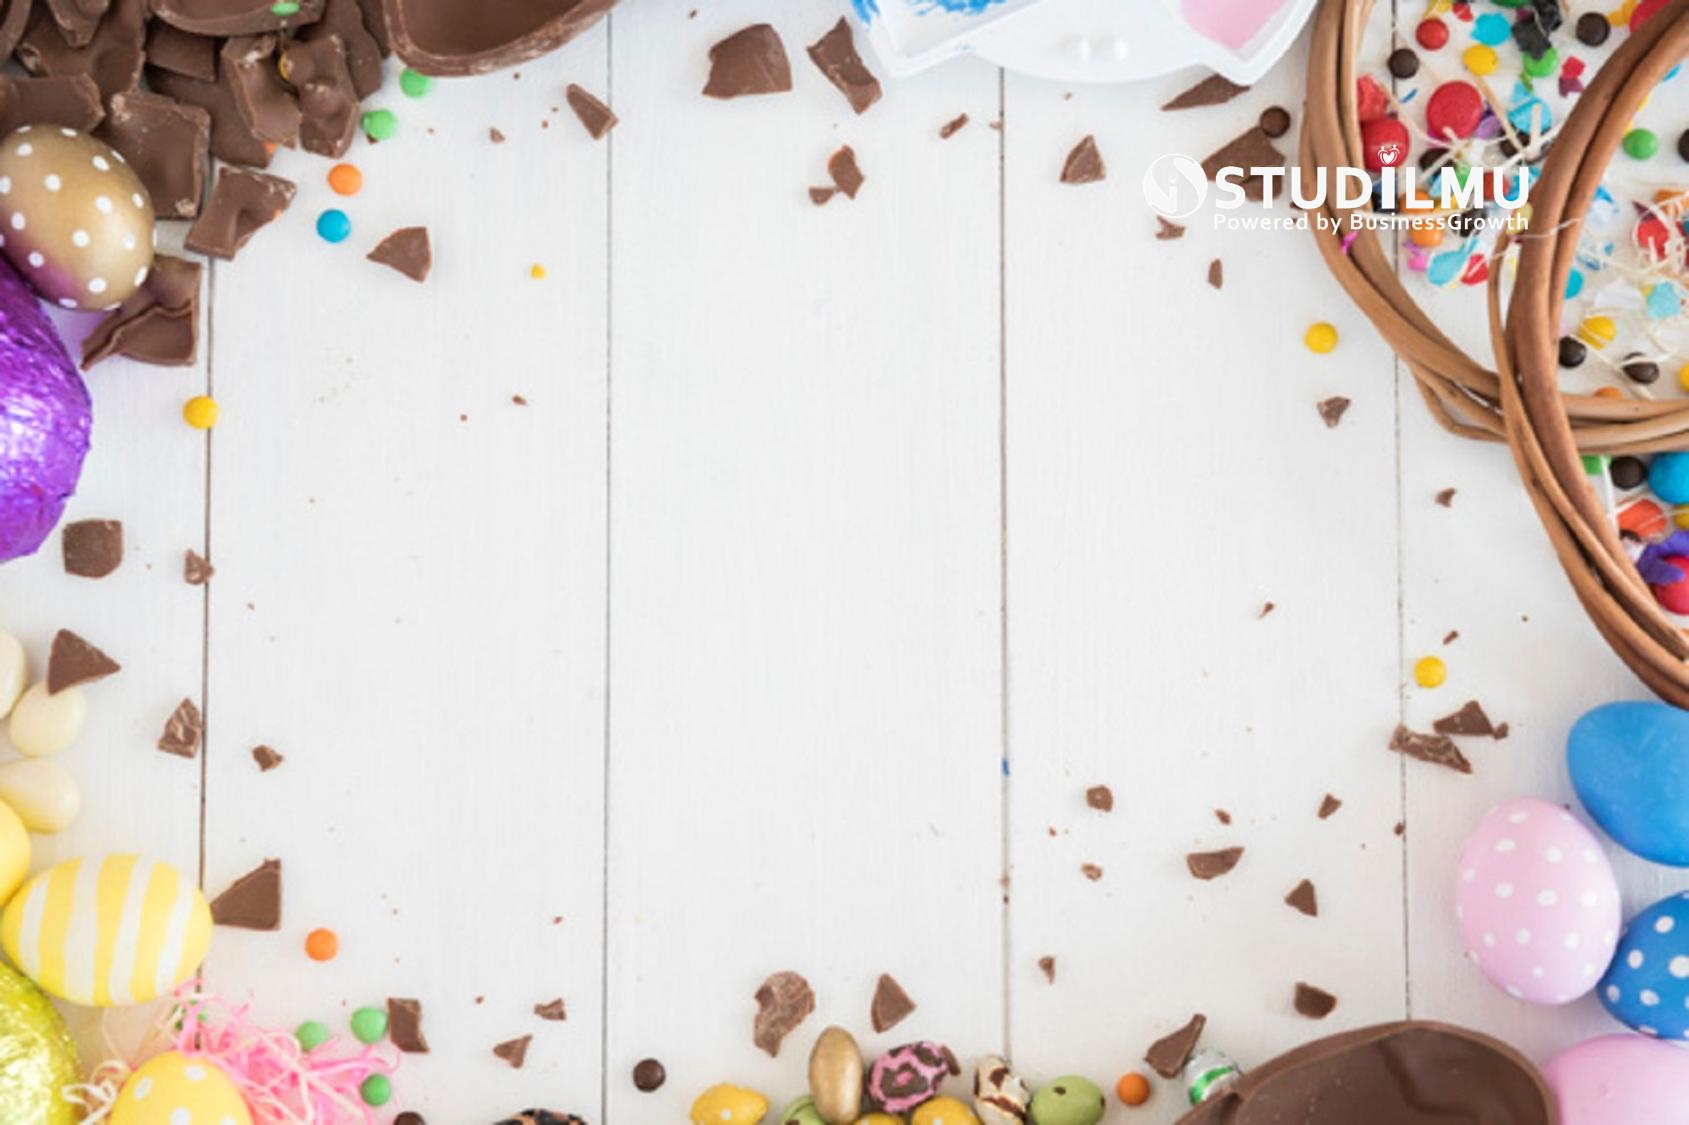 STUDILMU Career Advice - 5 Nilai Positif dari Aplikasi Permainan Anak: Candy Crush